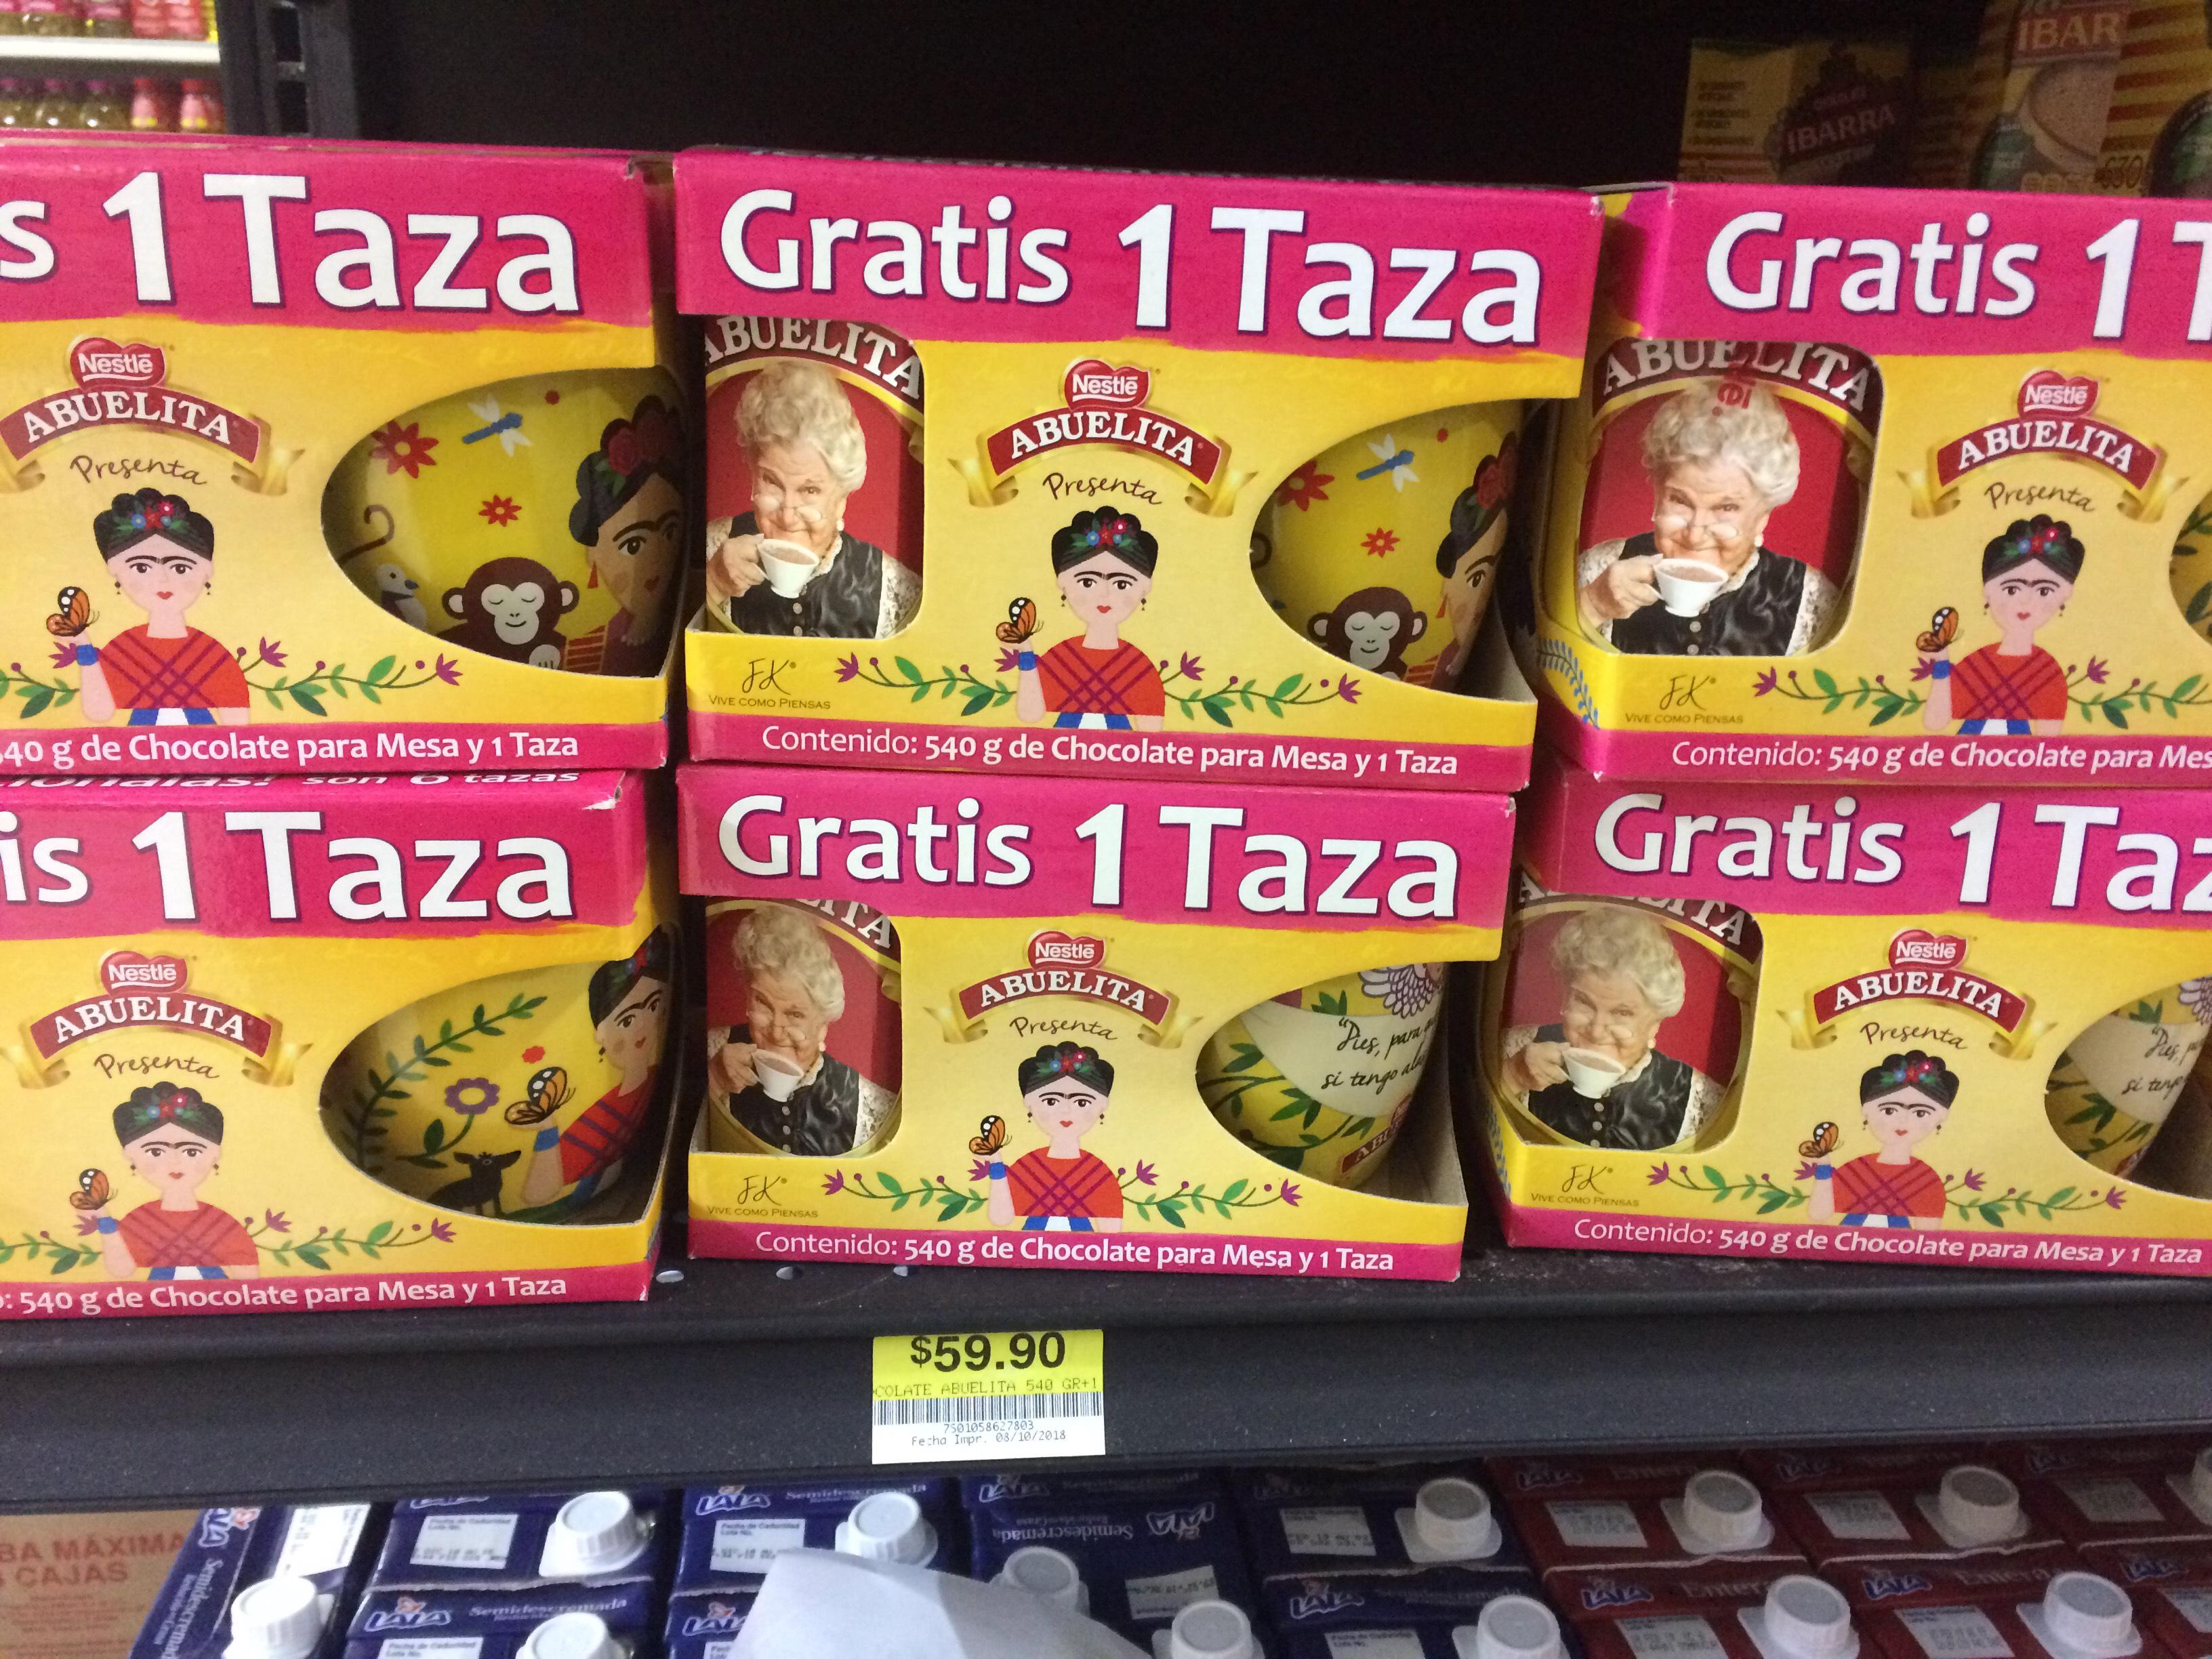 Chocolate abuelita: taza gratis